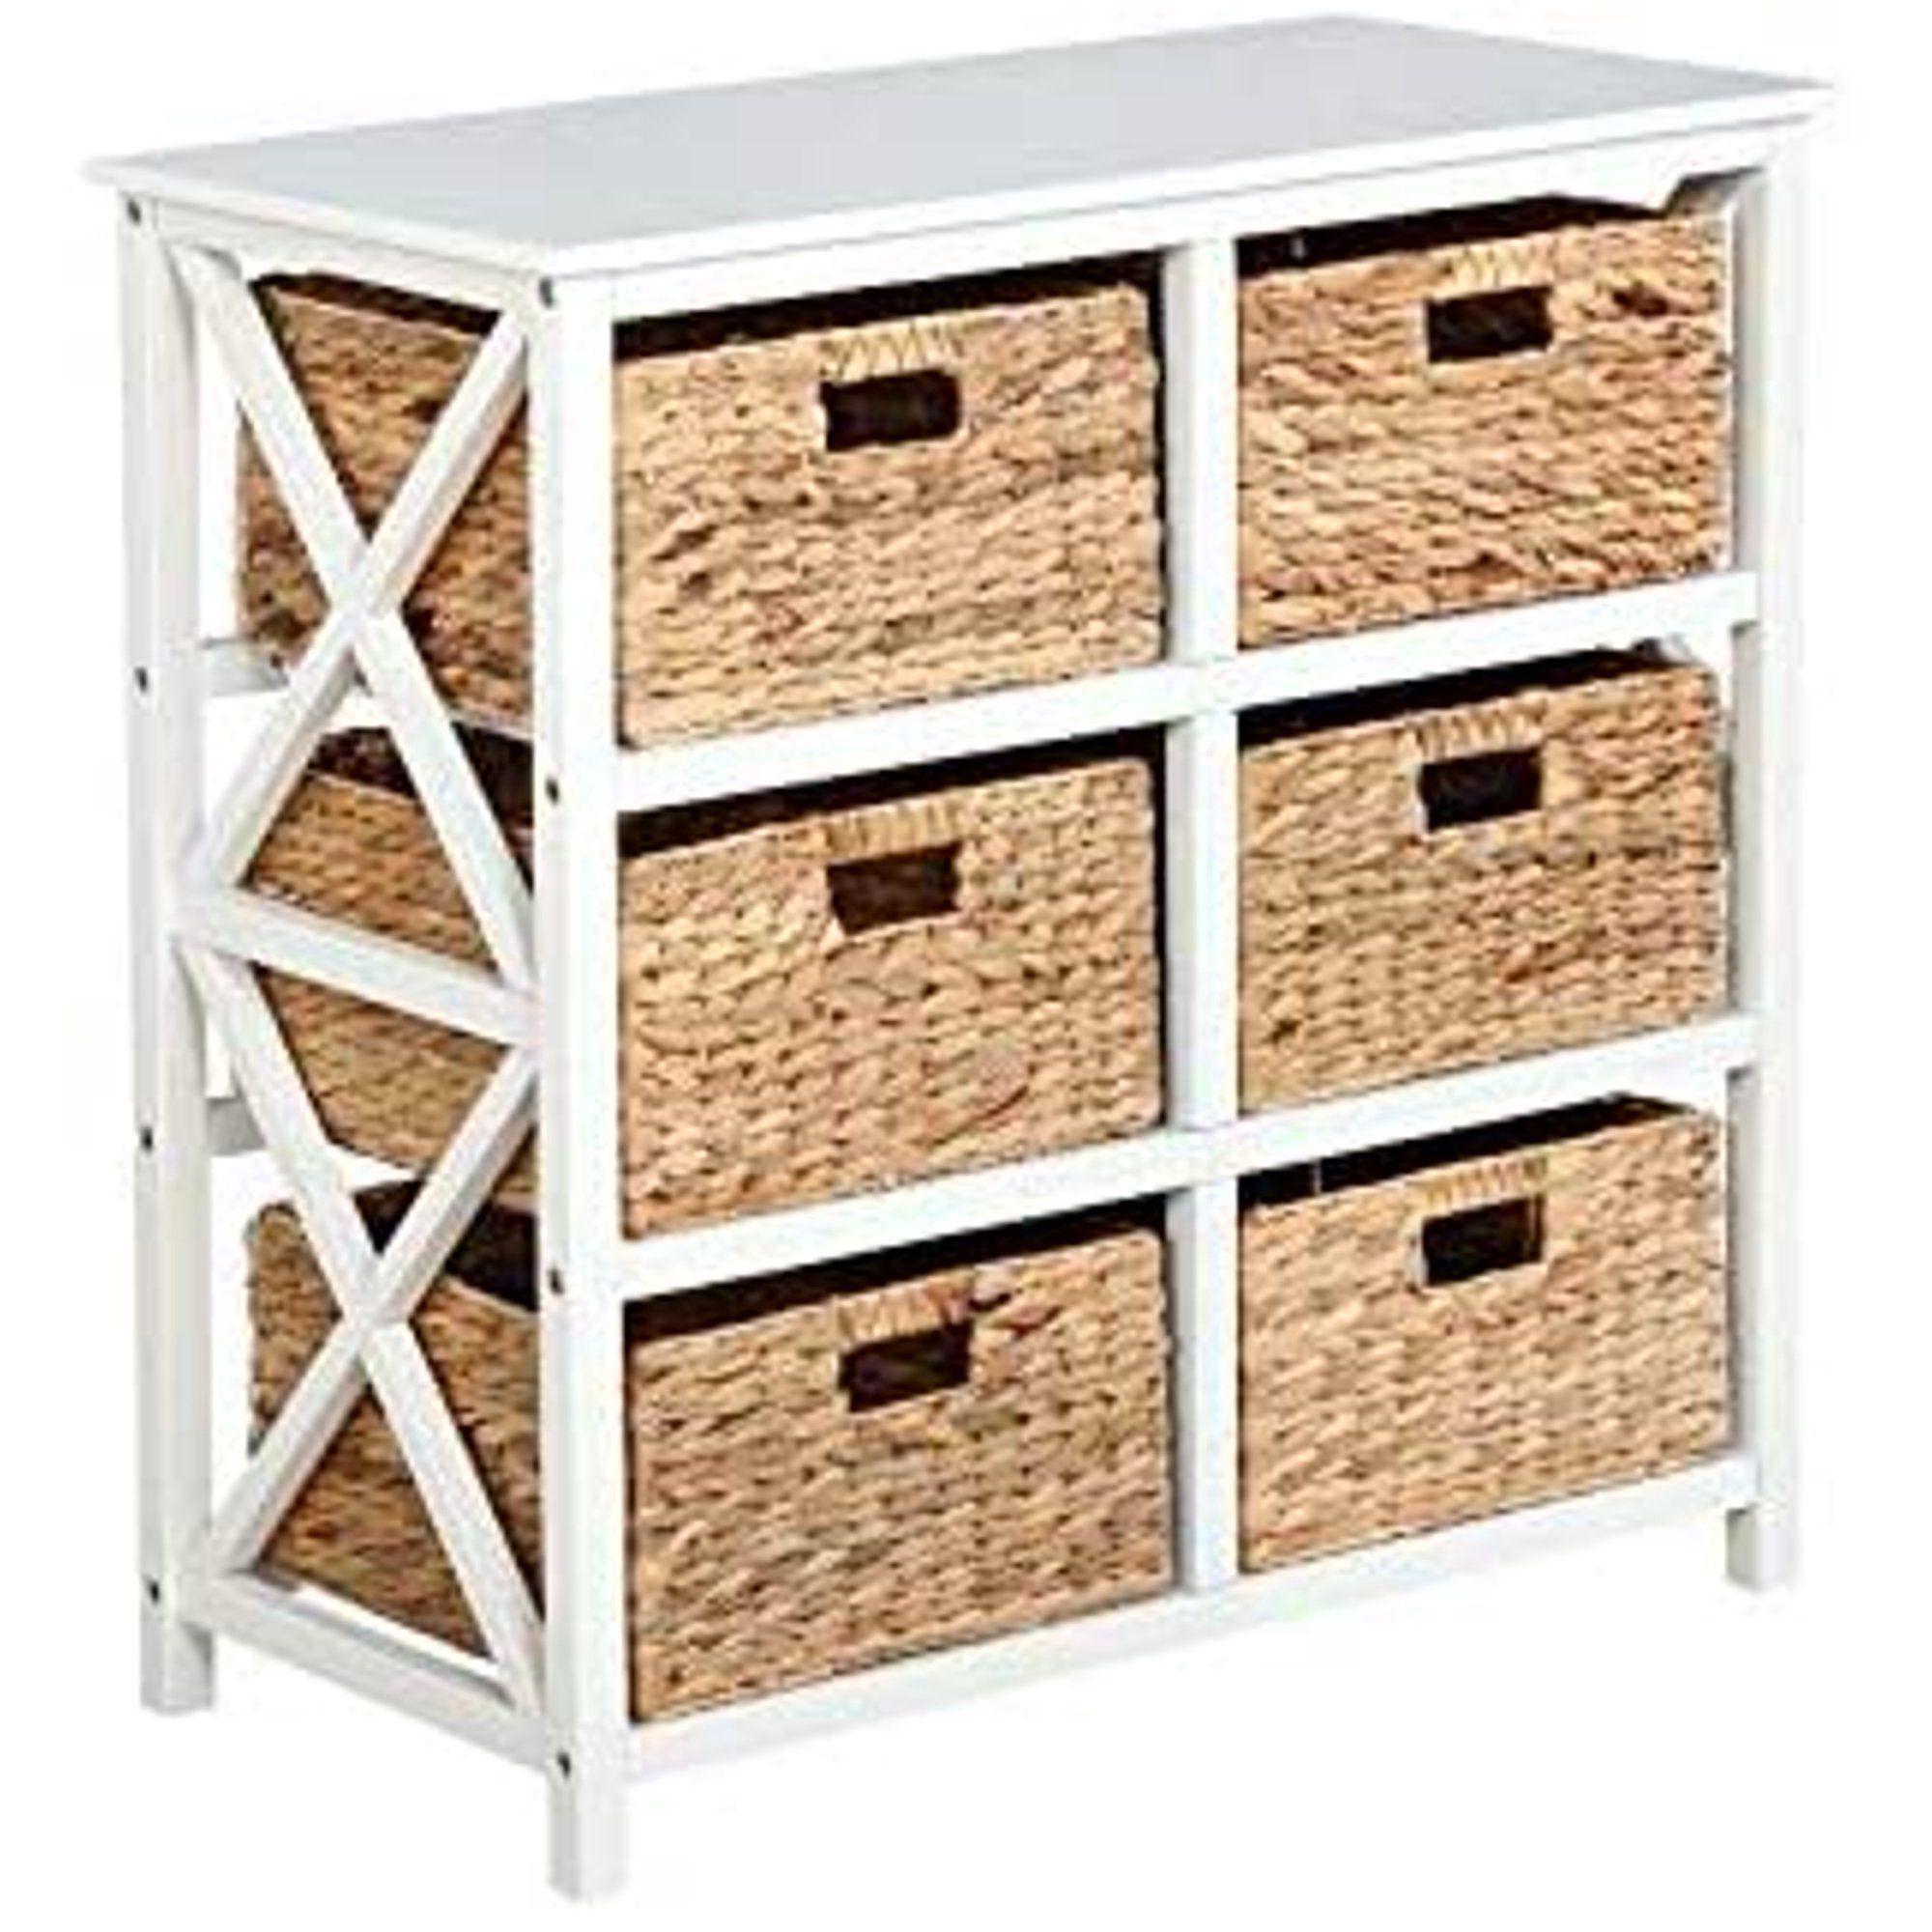 3 Tier X Side Storage Cabinet With 6 Baskets In White Walmart Com In 2021 Storage Cabinet With Baskets Drawer Storage Unit Storage Furniture Bedroom